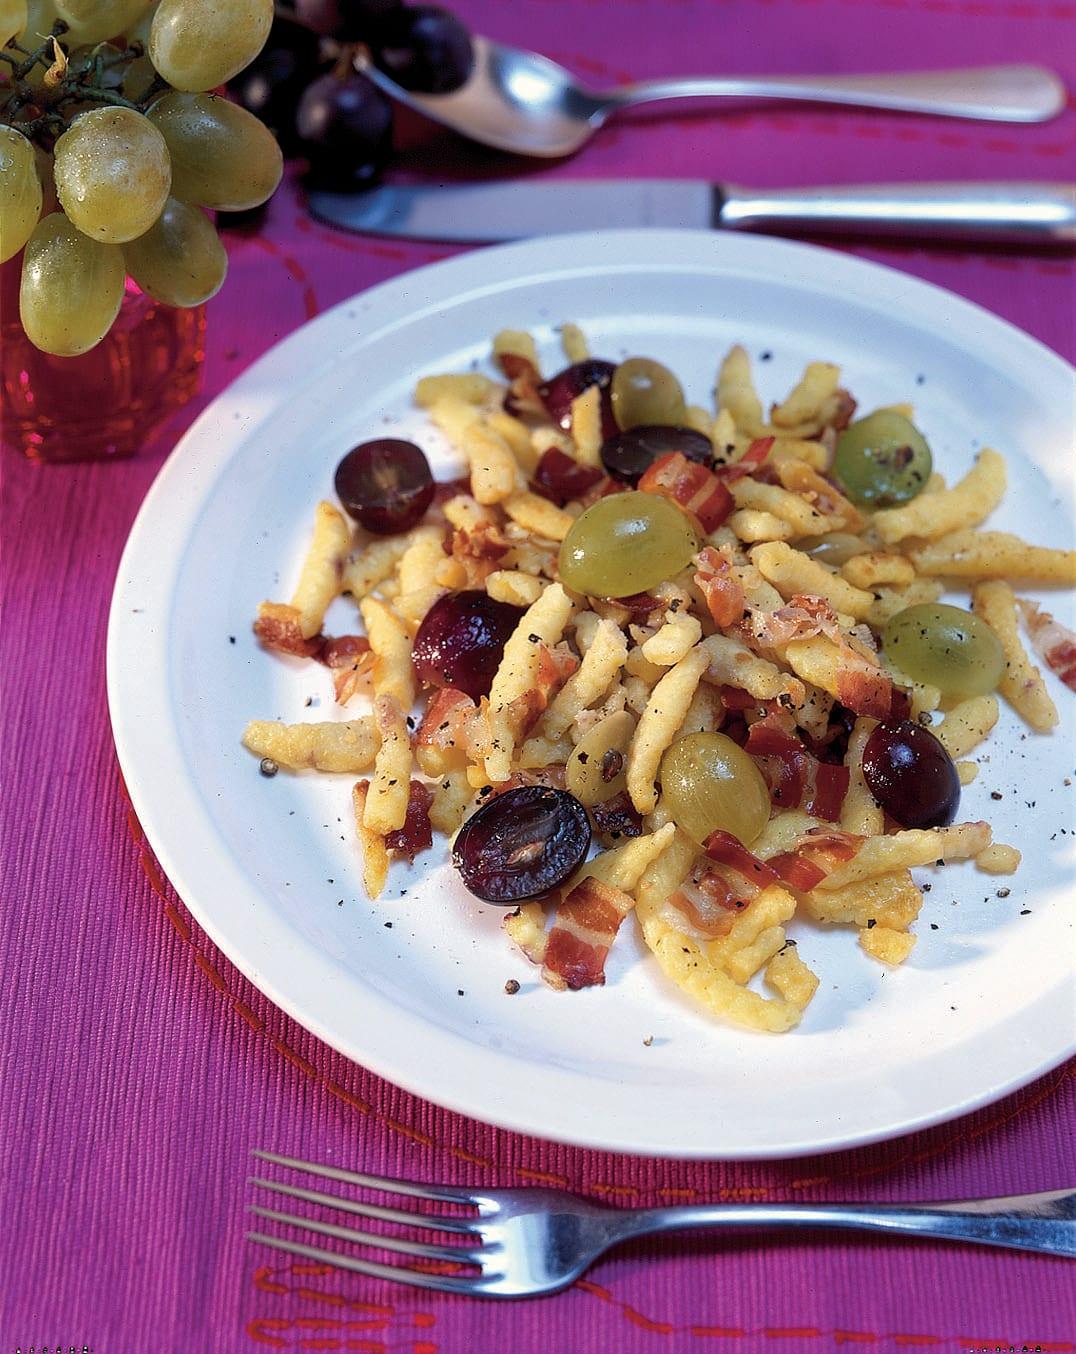 Knöpfli aux raisins et au lard